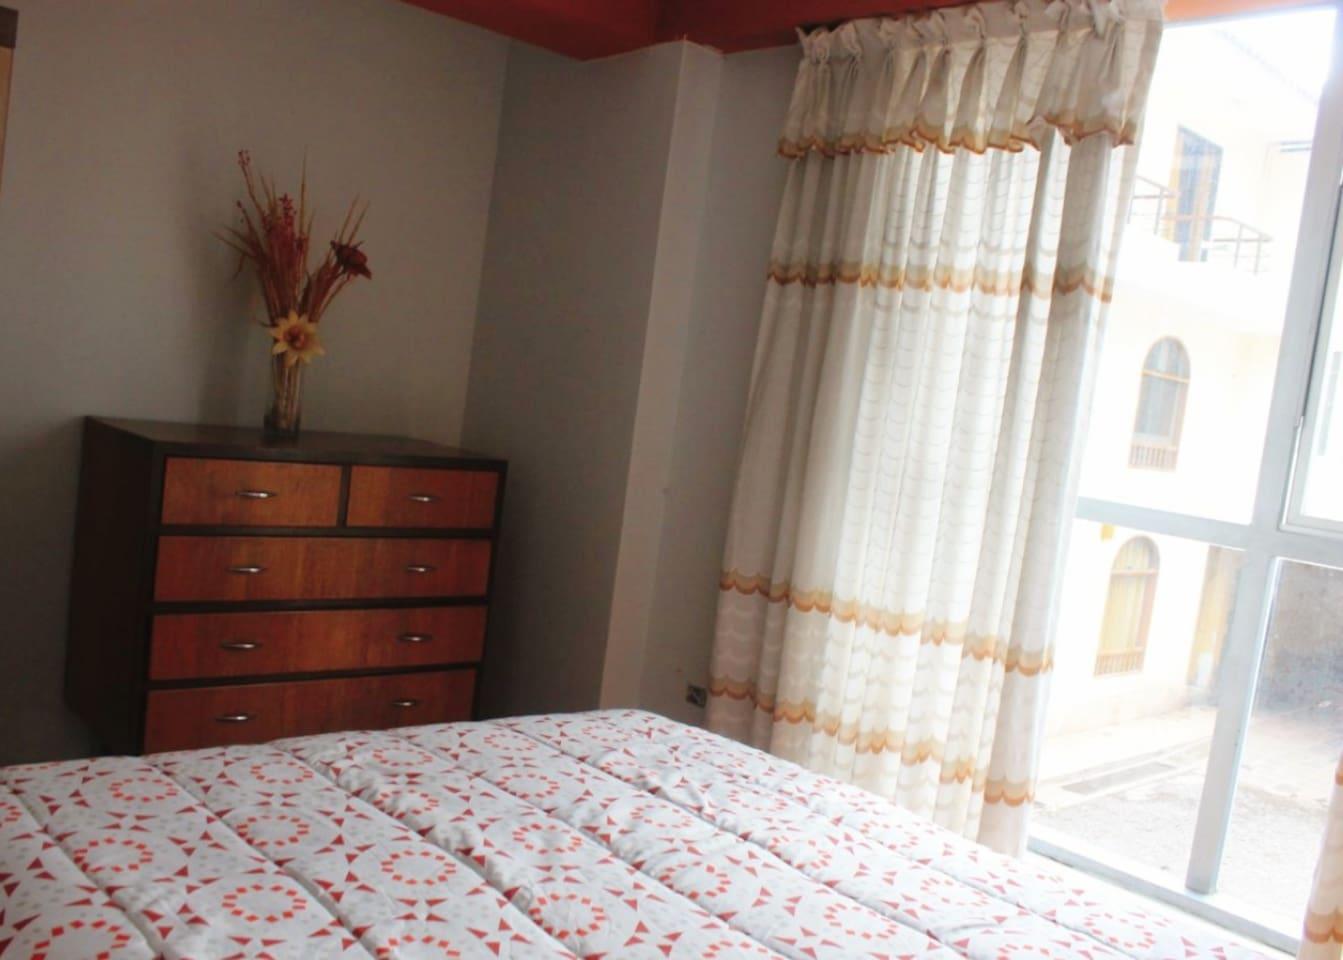 Dormitorio iluminado